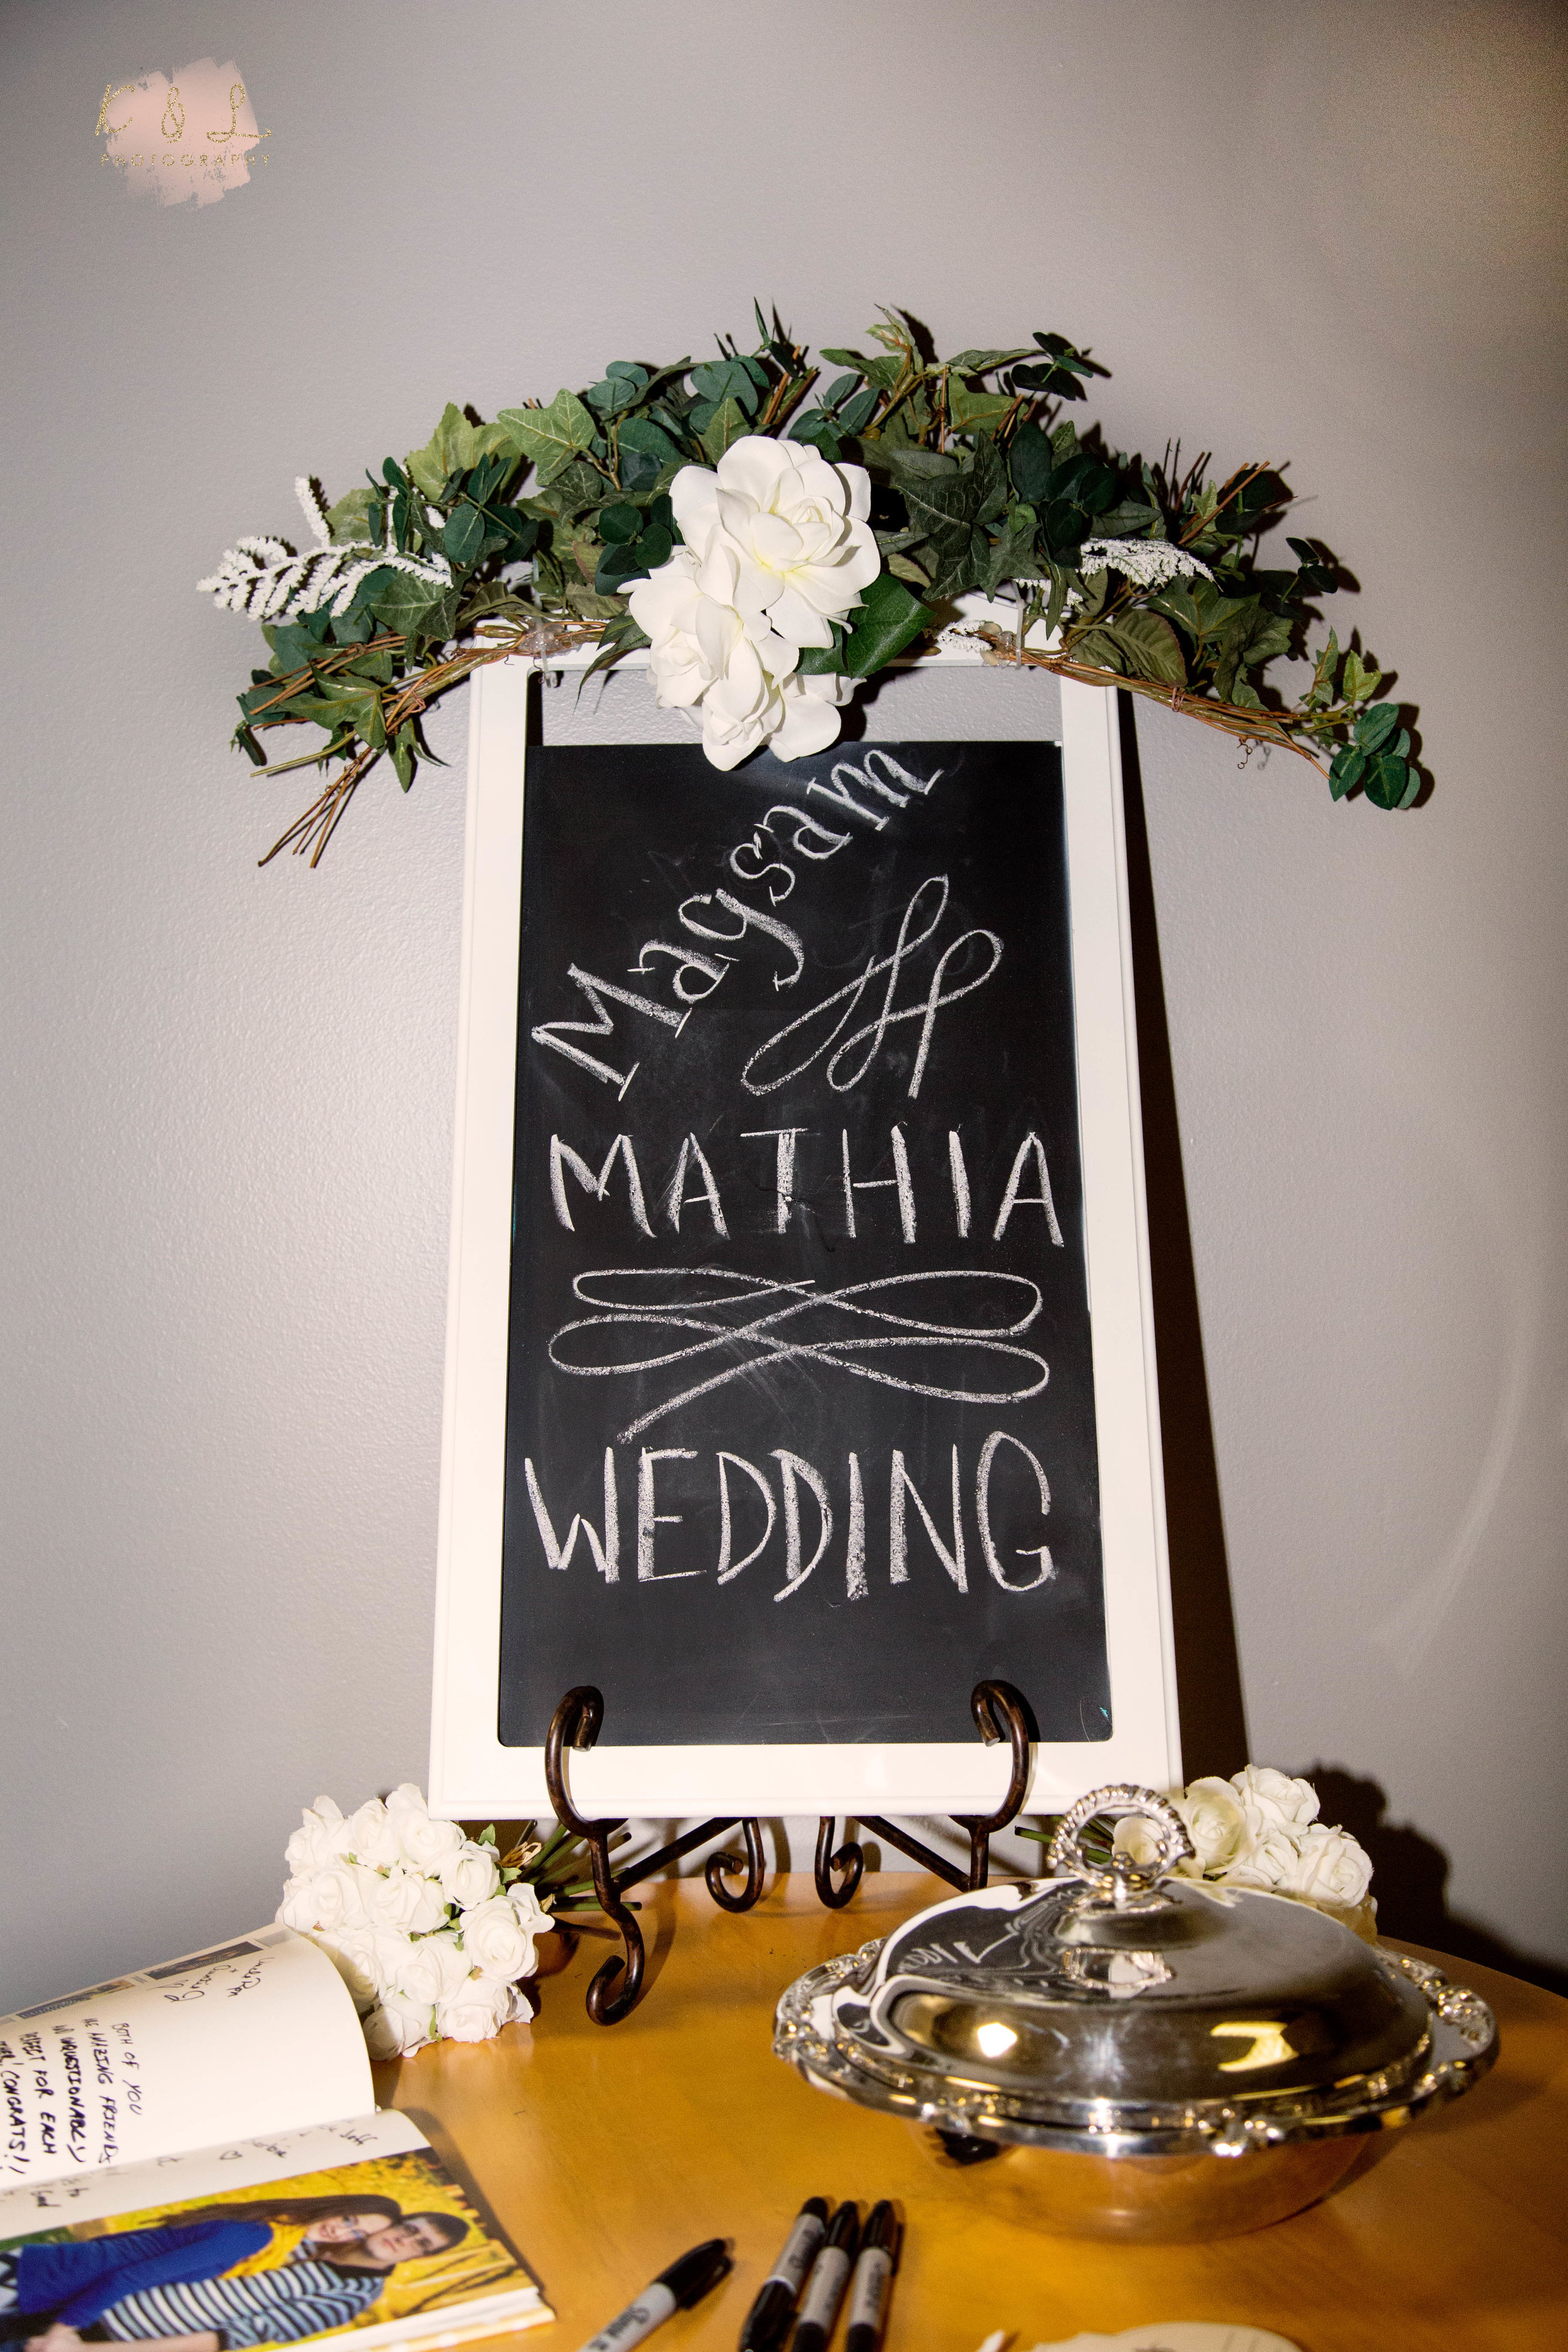 Mathia_Wedding_2017-18.jpg